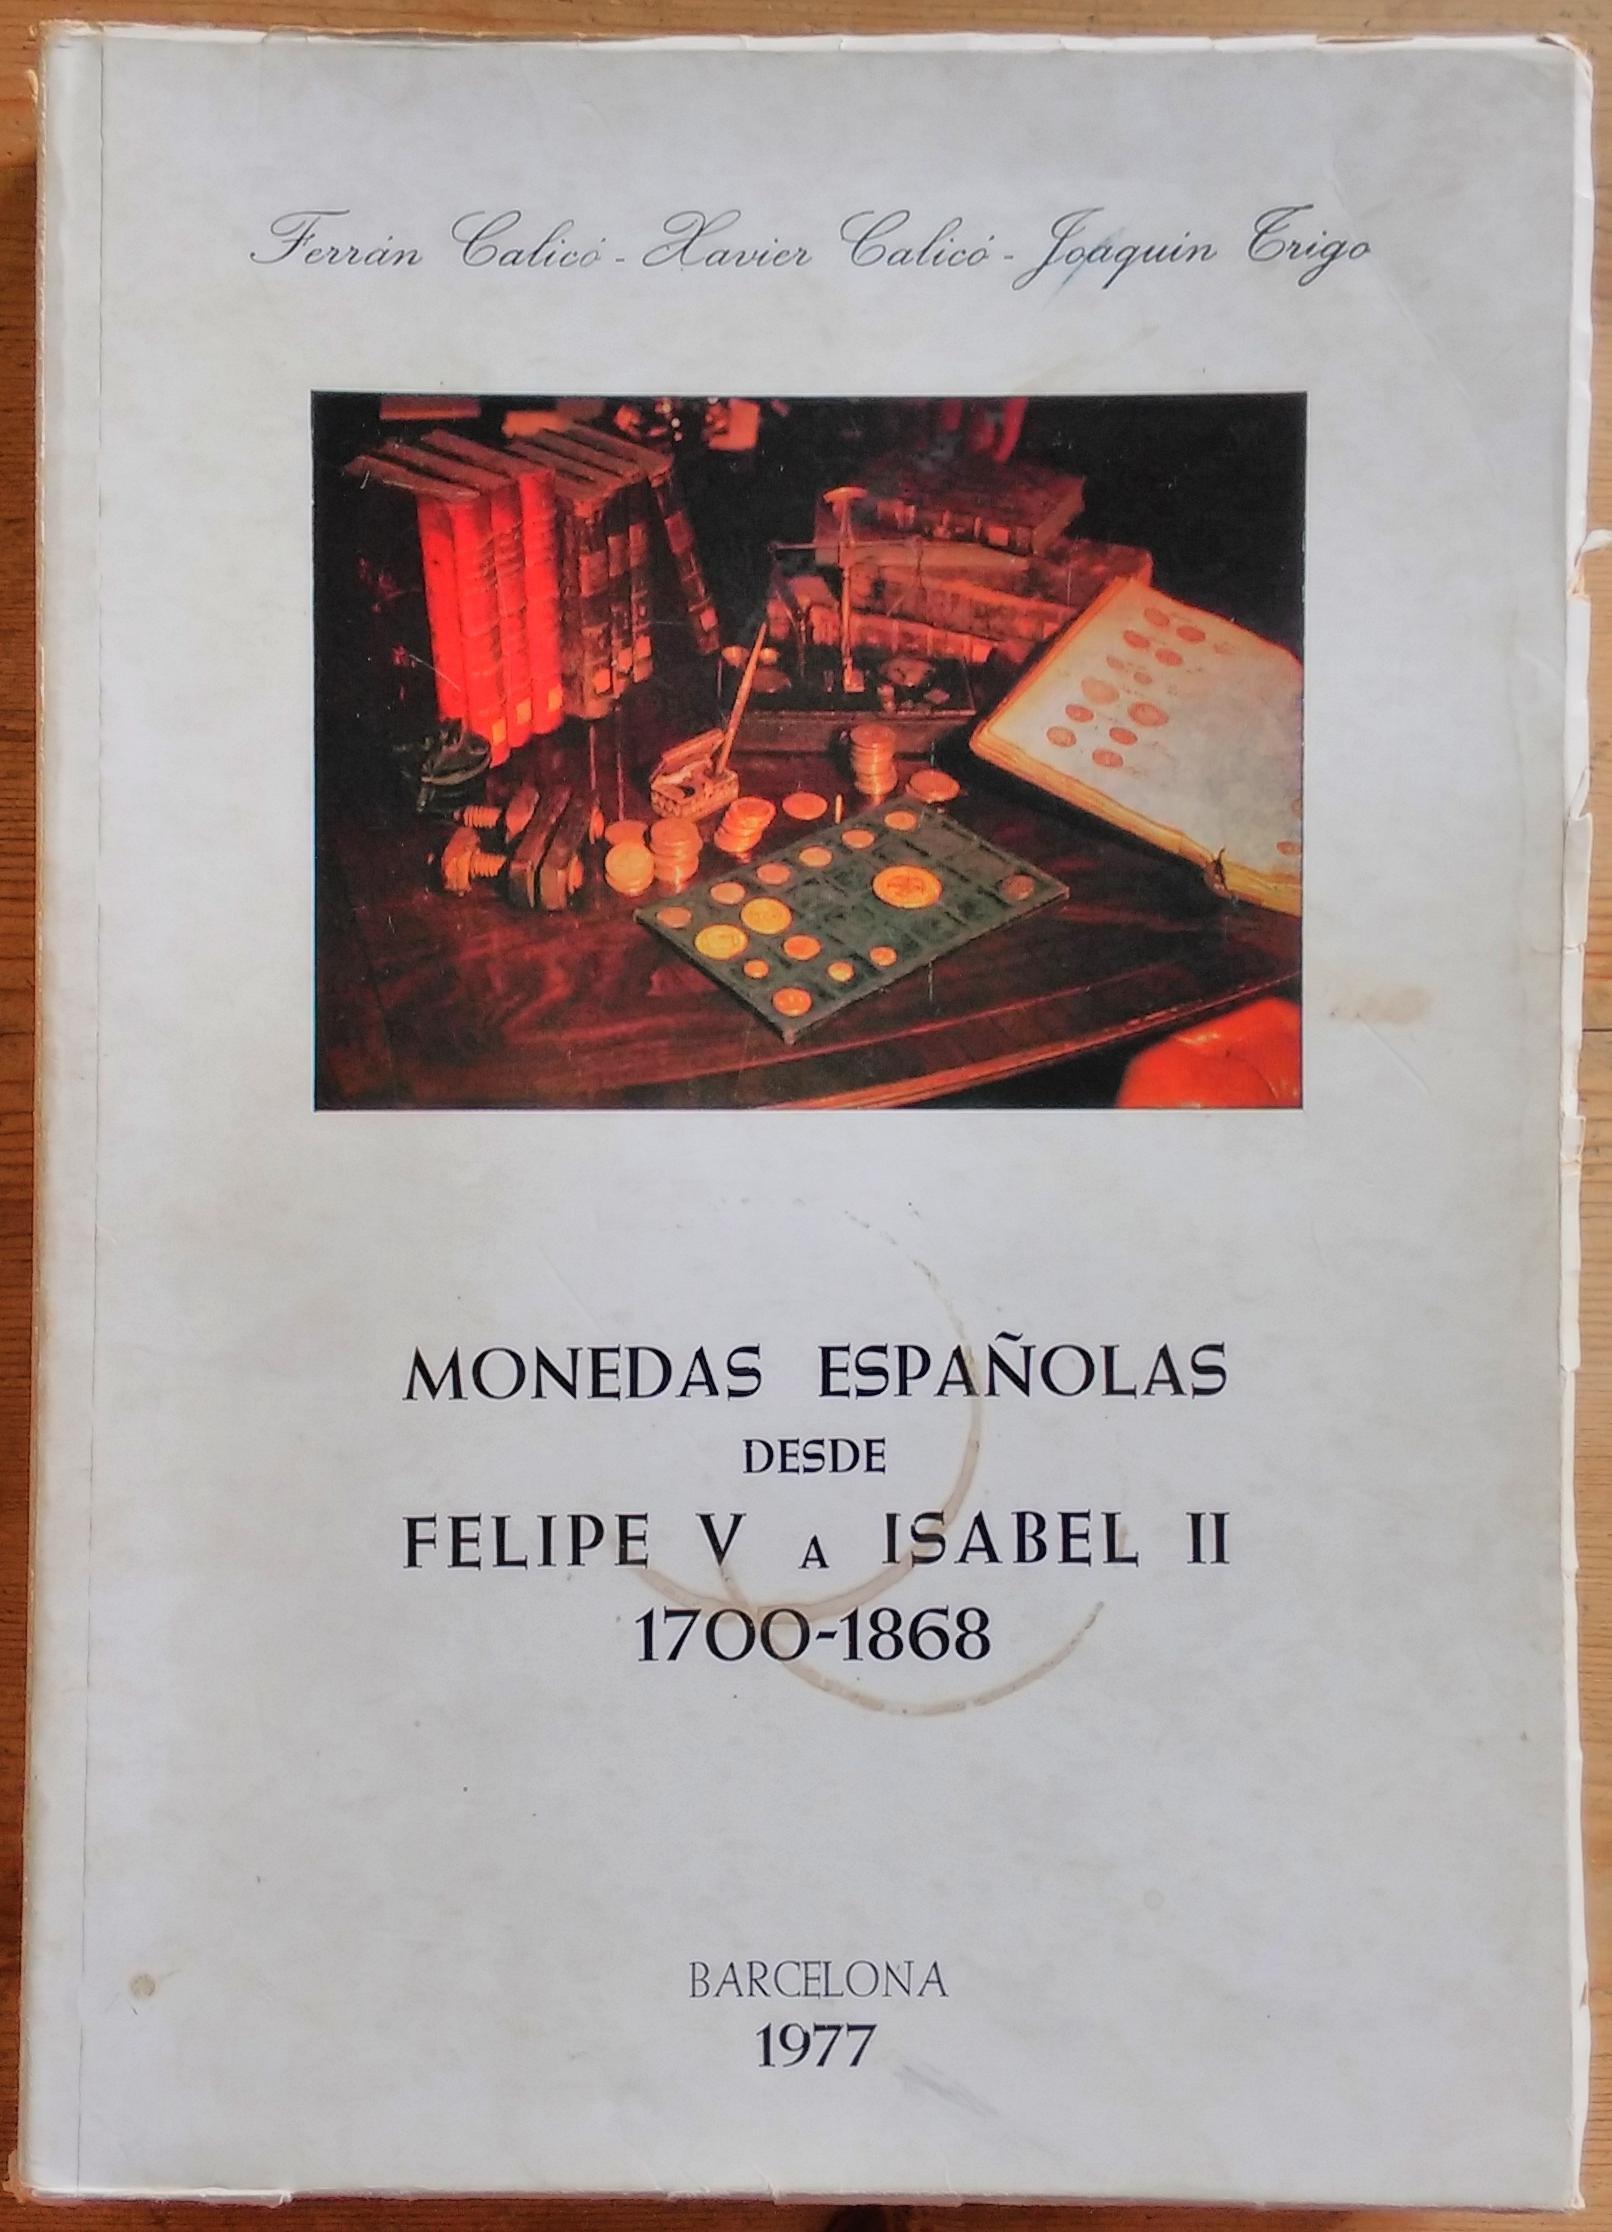 MONEDAS ESPAÑOLAS DESDE FELIPE V A ISABEL II 1700 - 1868: Amazon.es: Ferran Calico - Xavier Calico - Joaquin Trigo: Libros